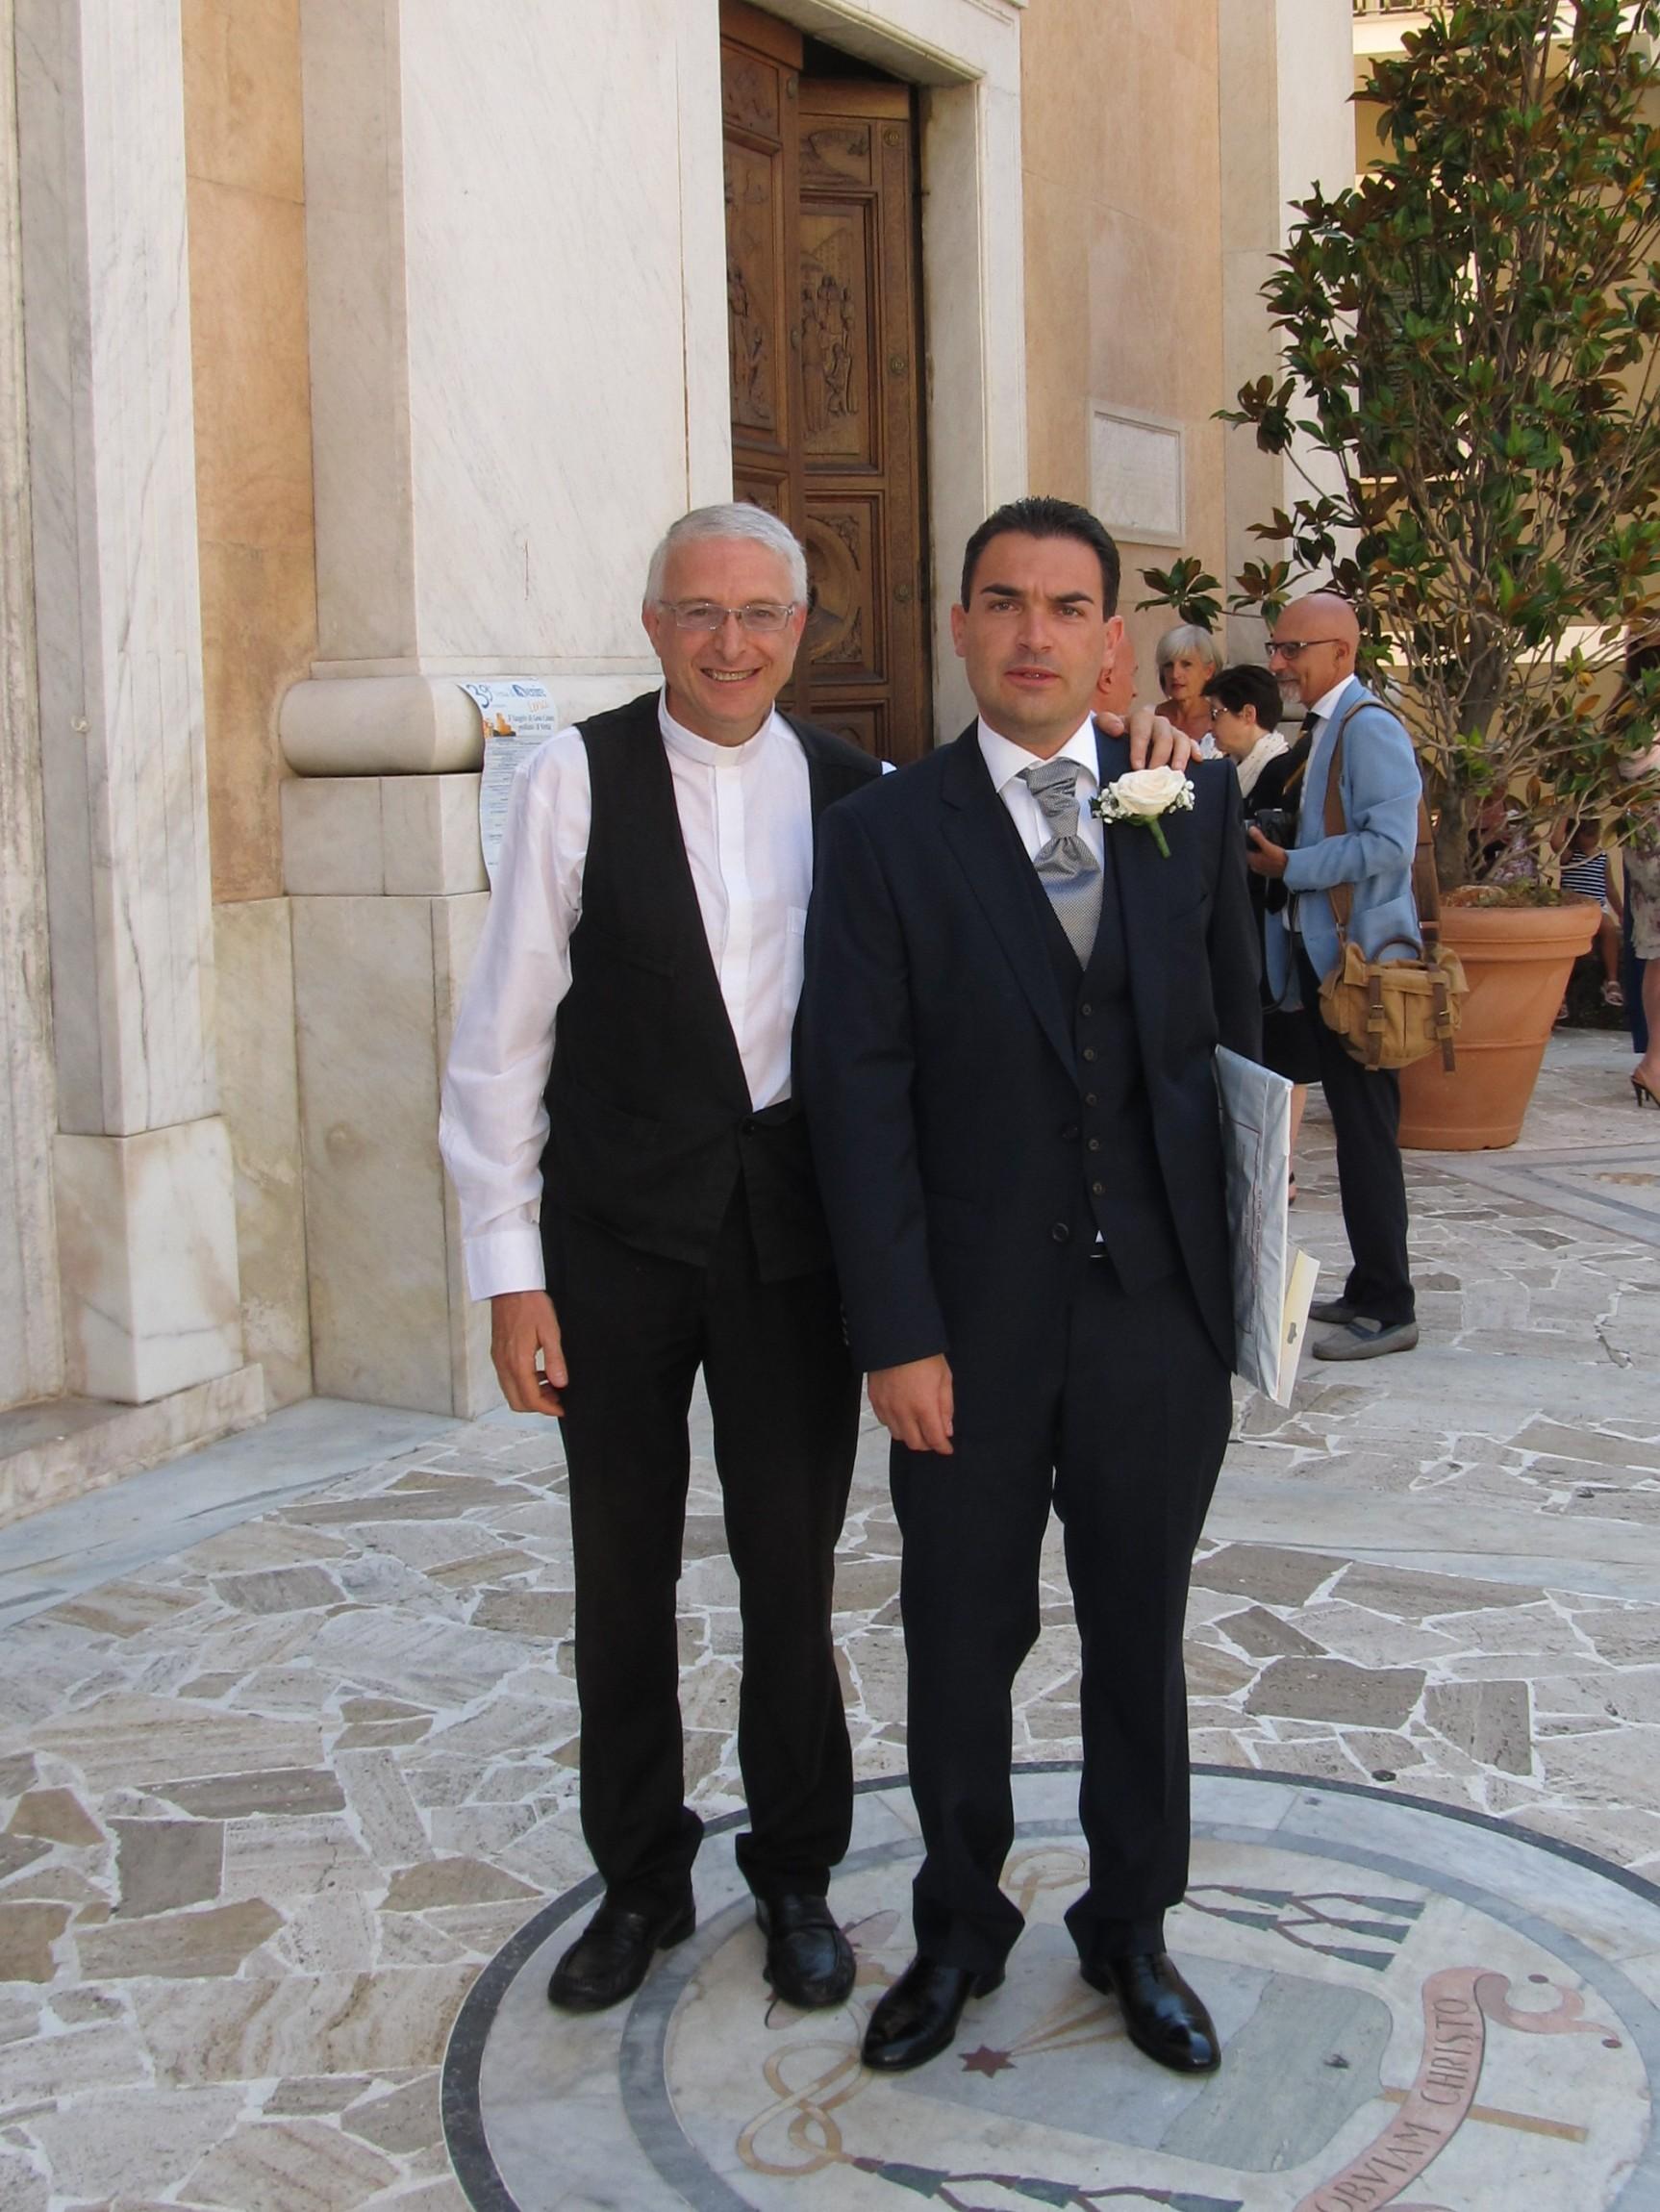 matrimonio_piccardo_franzi_2014-07-19-10-53-38